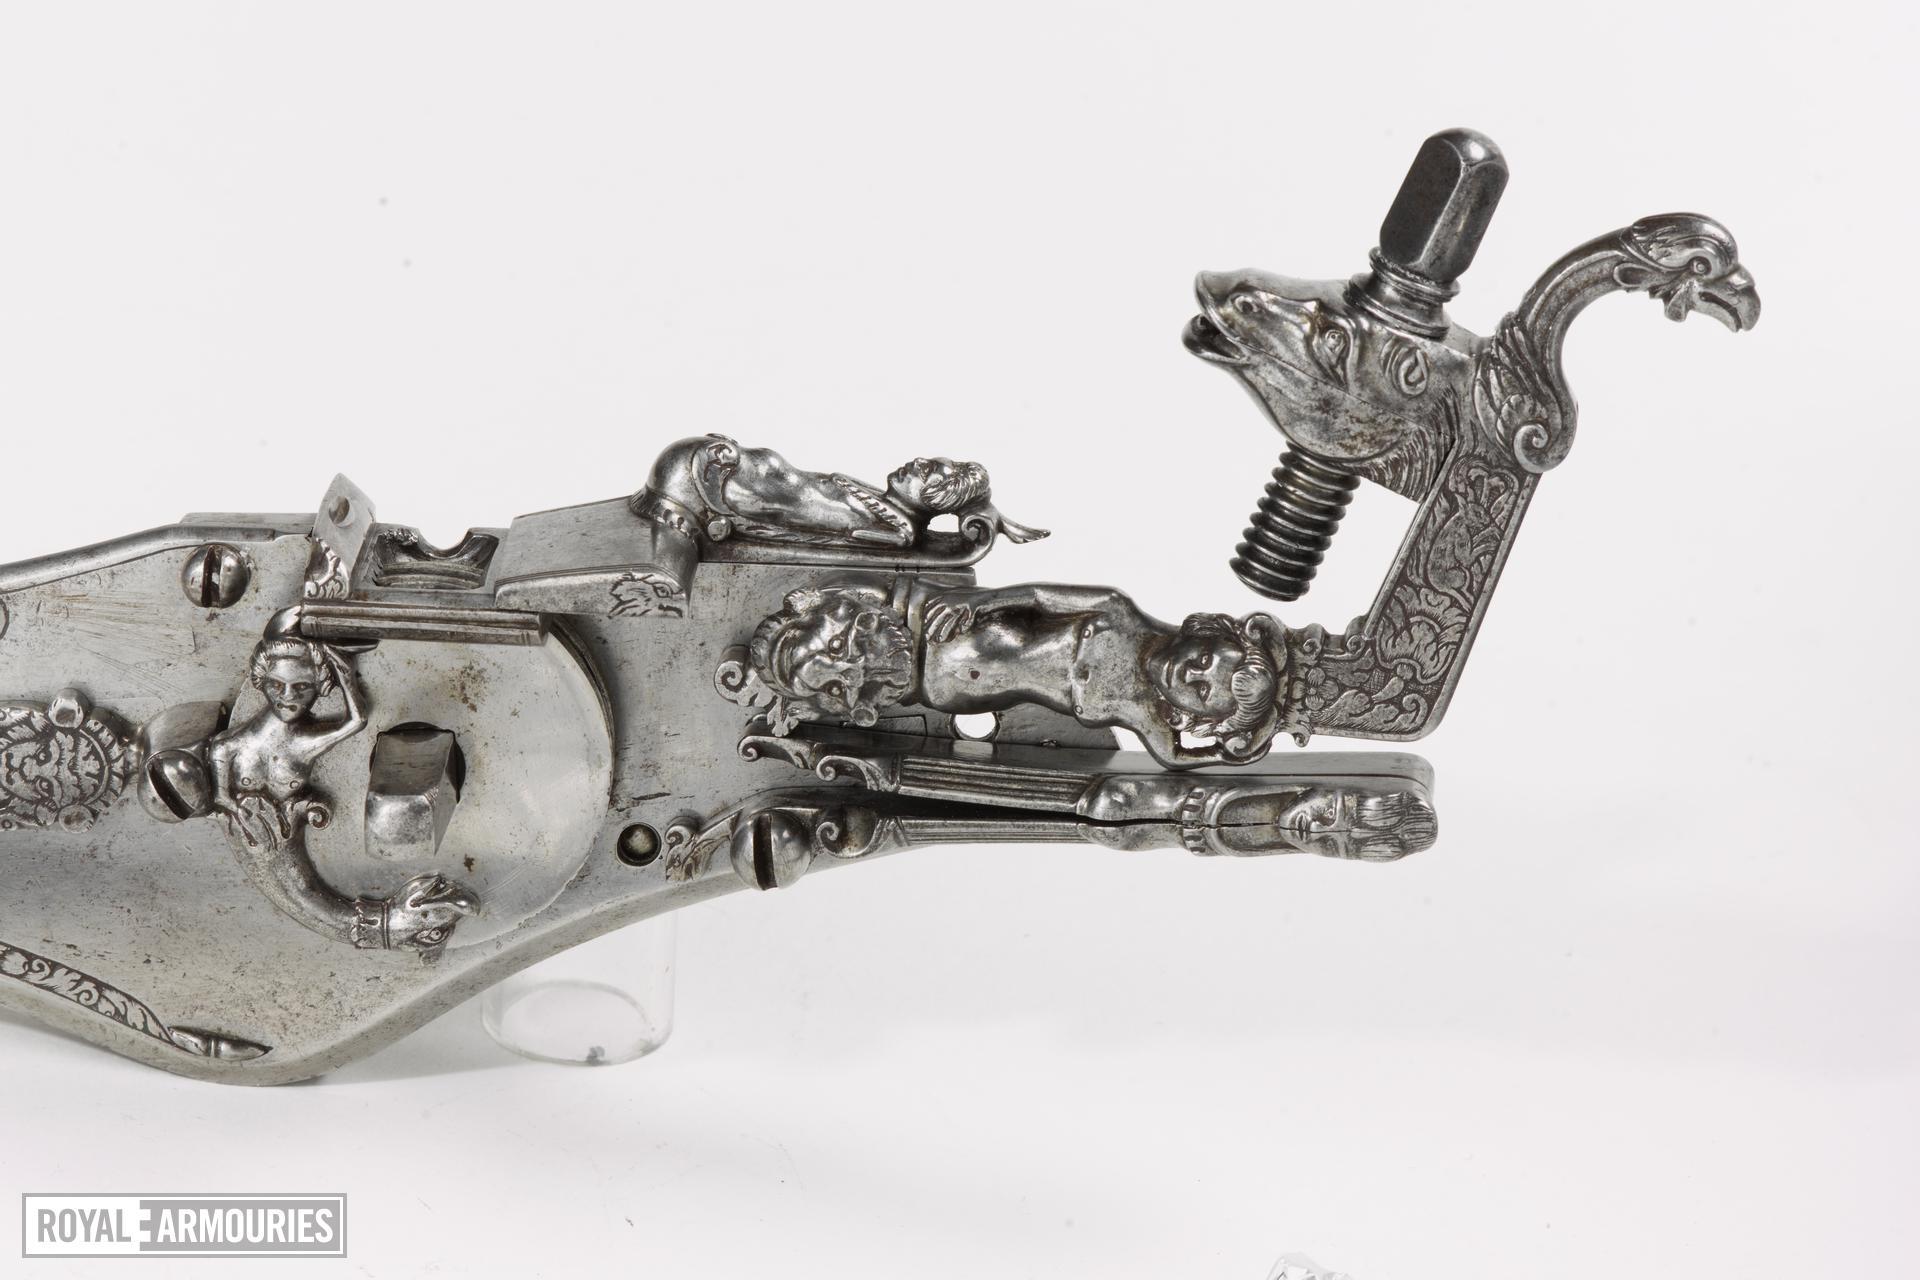 Parts of a wheellock gun See under suffixes